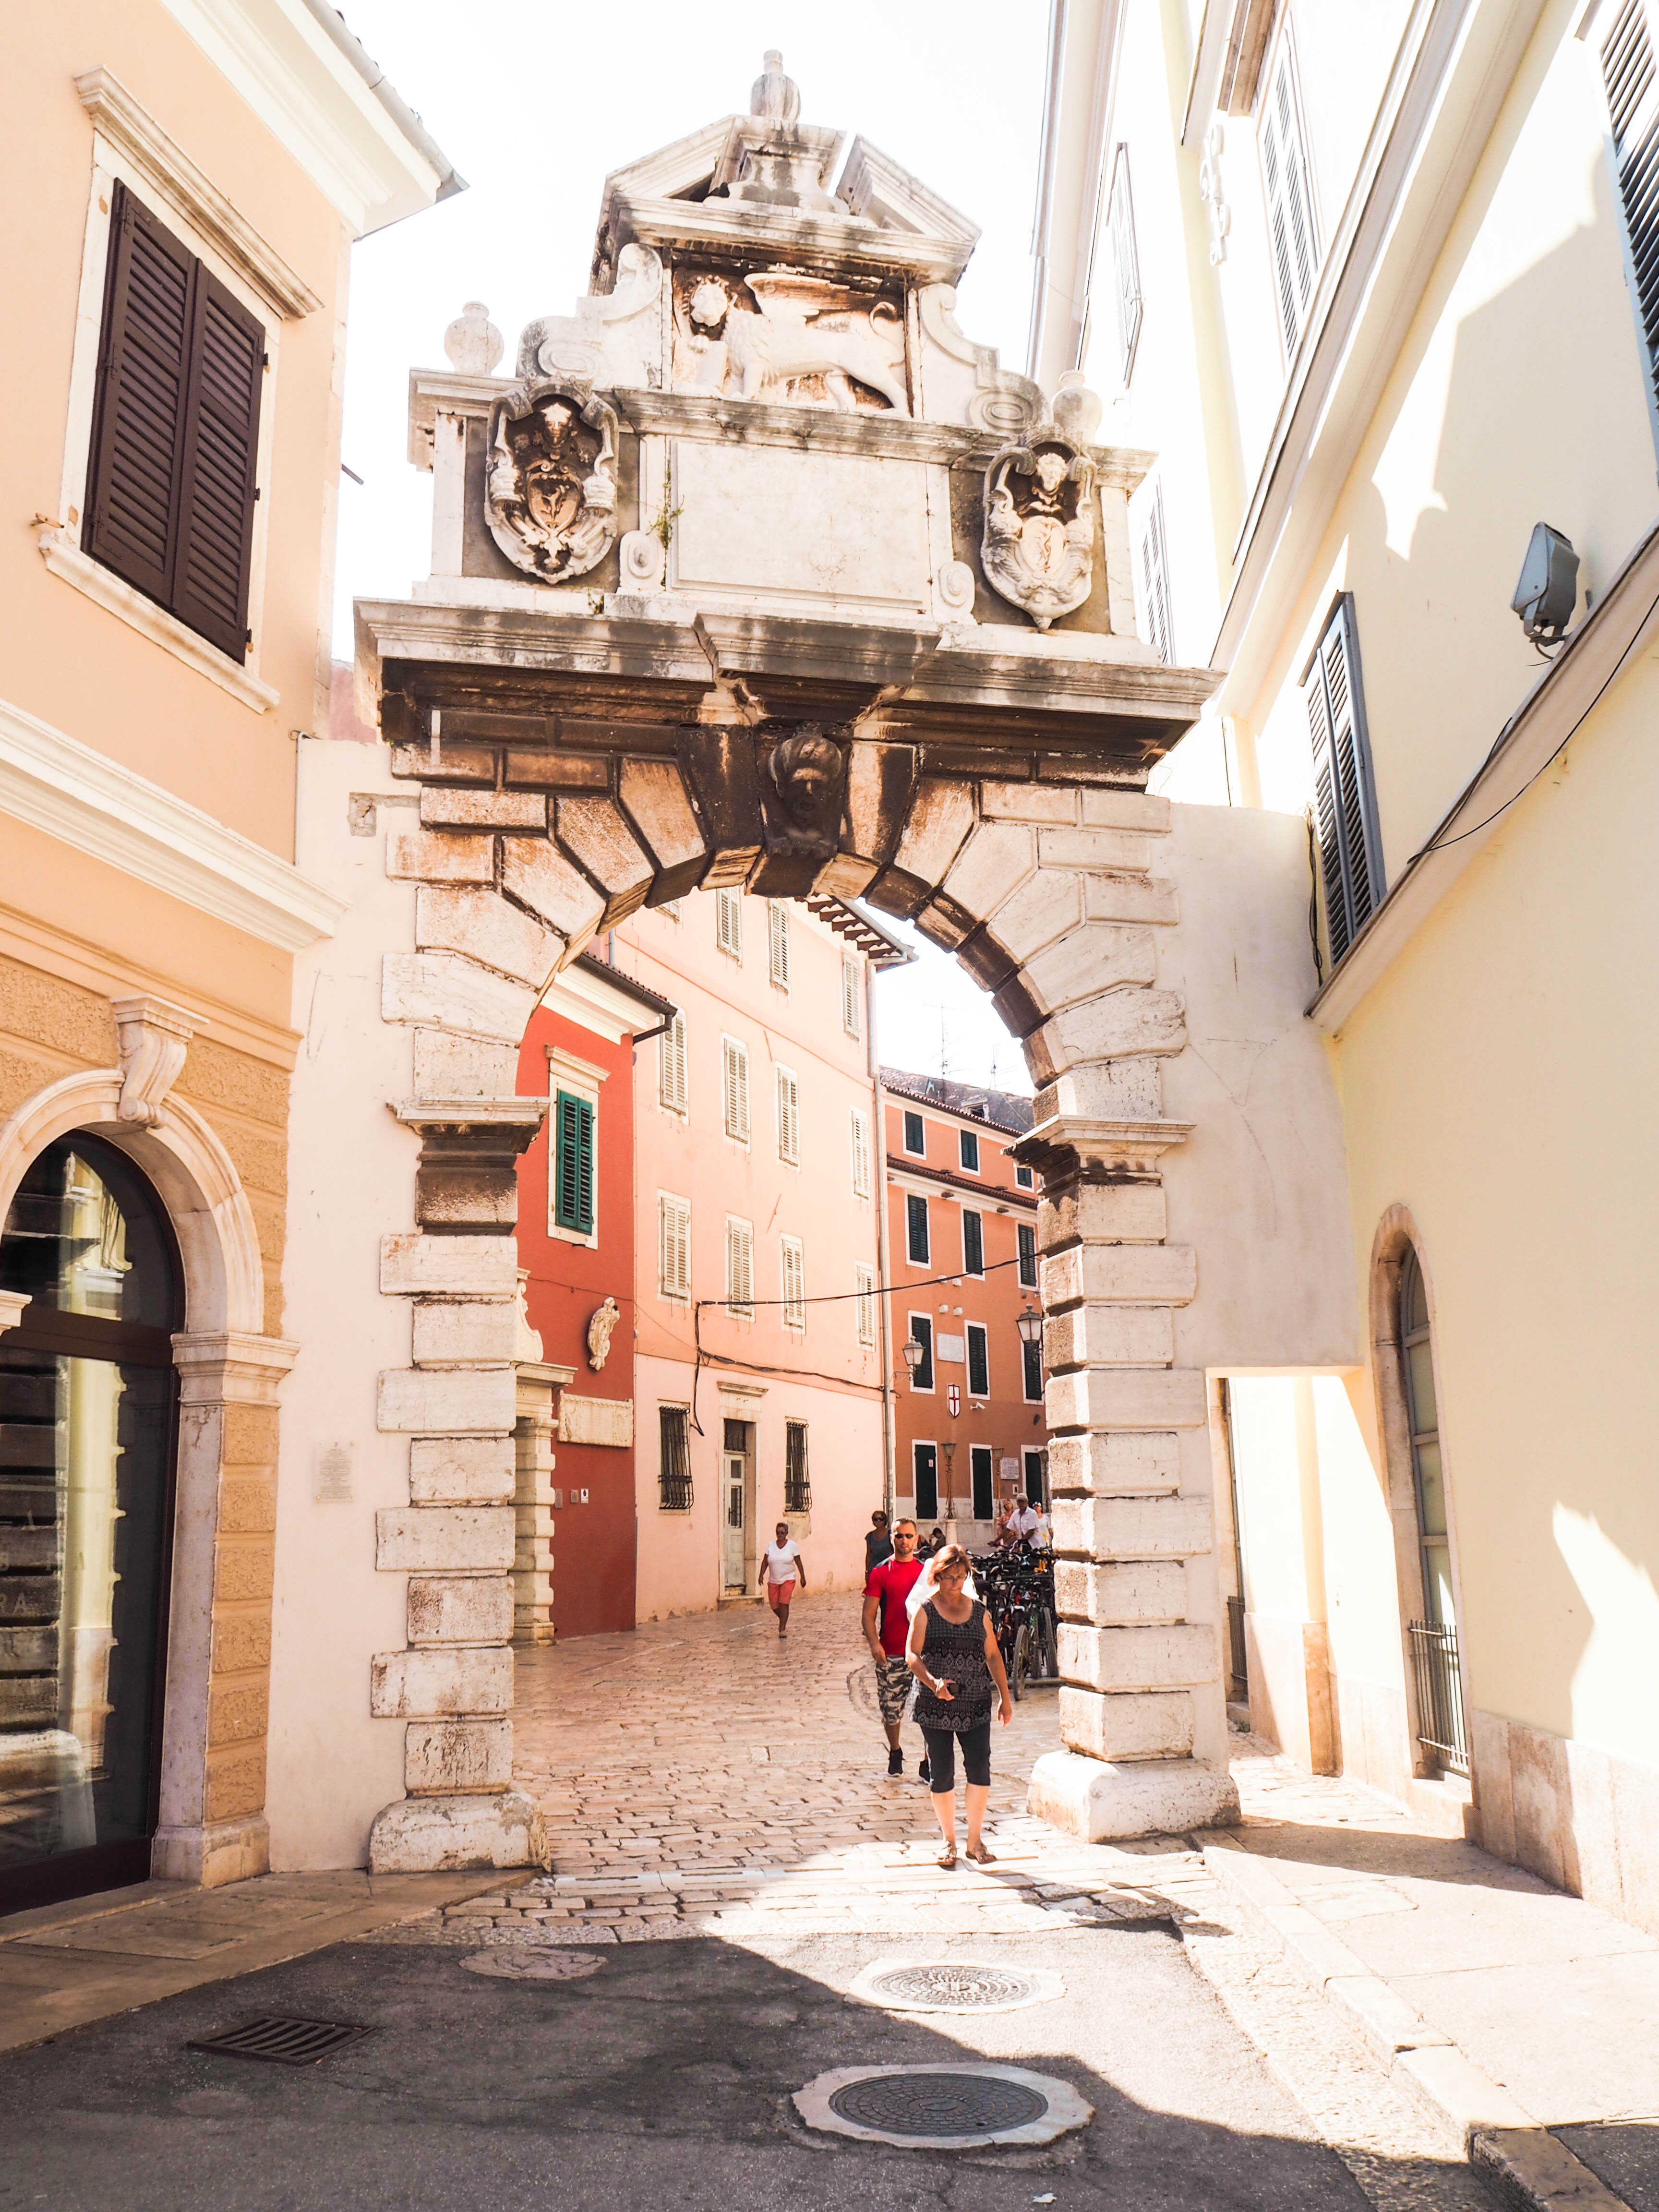 Balbi's Arch, Rovinj, Croatia